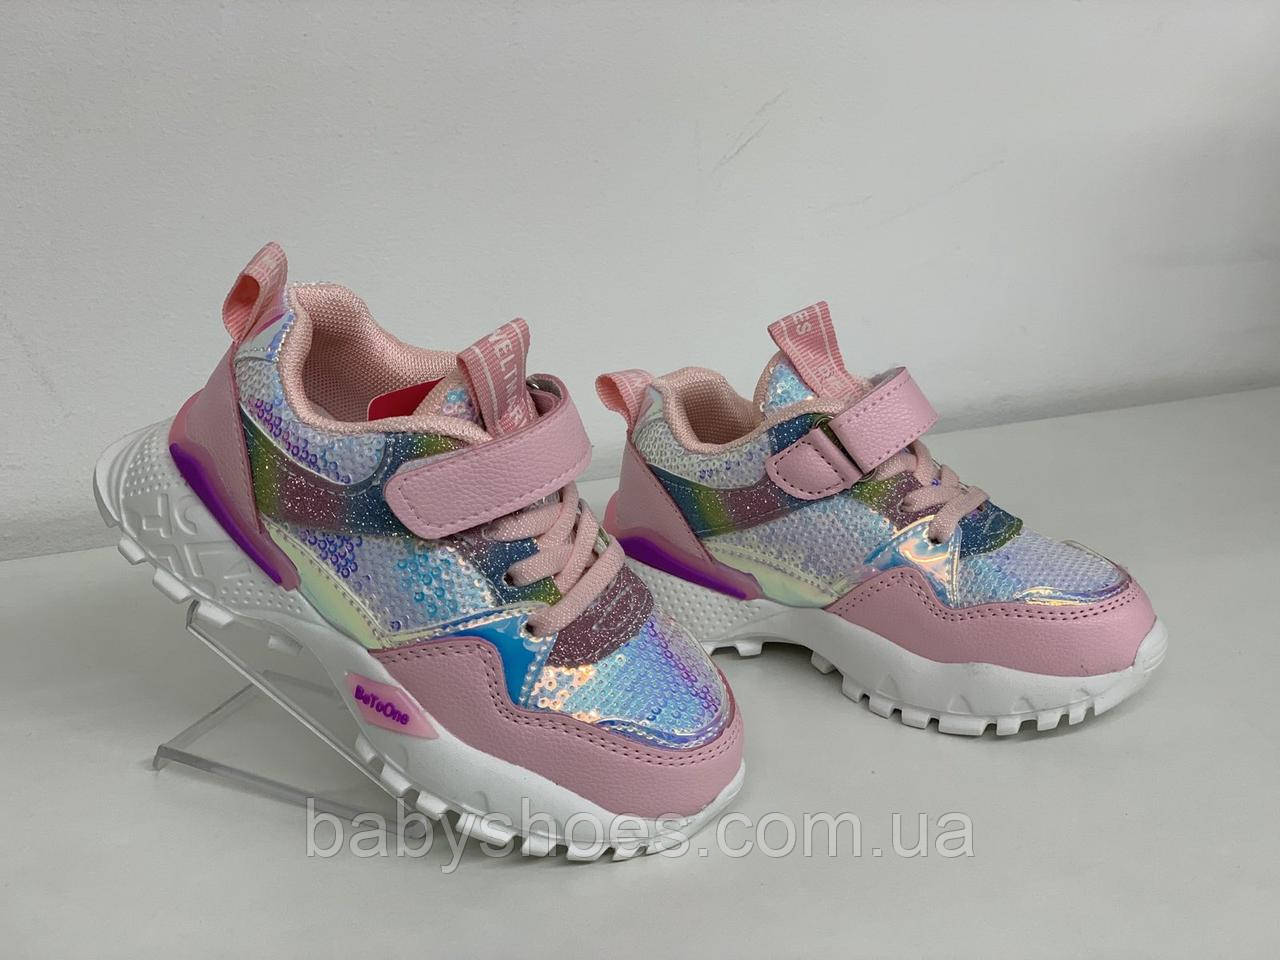 Кроссовки для девочки CSCK.S р.25-30 КД-542